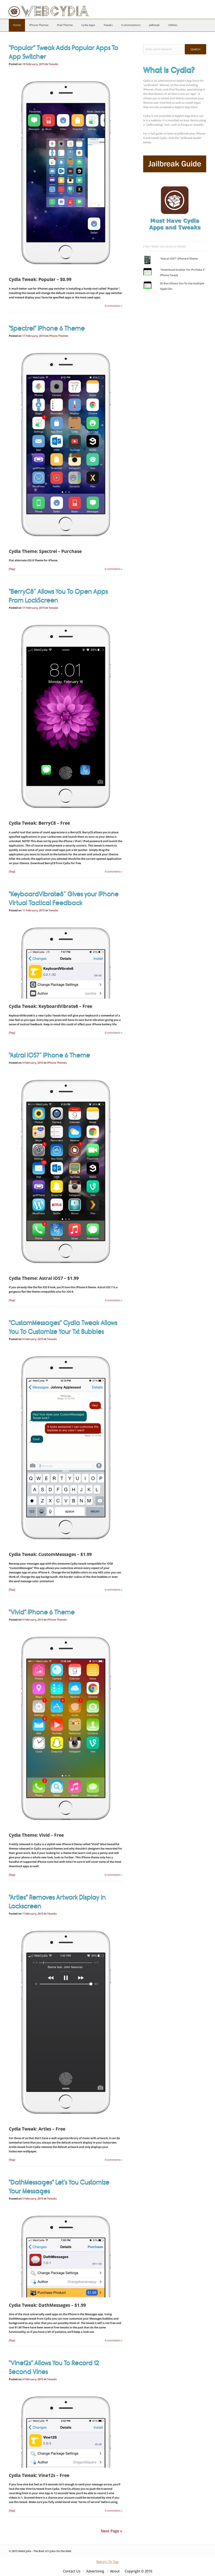 Ui problems with protube (cydia) [ios 7. 1. 2, iphone 4]: jailbreak.